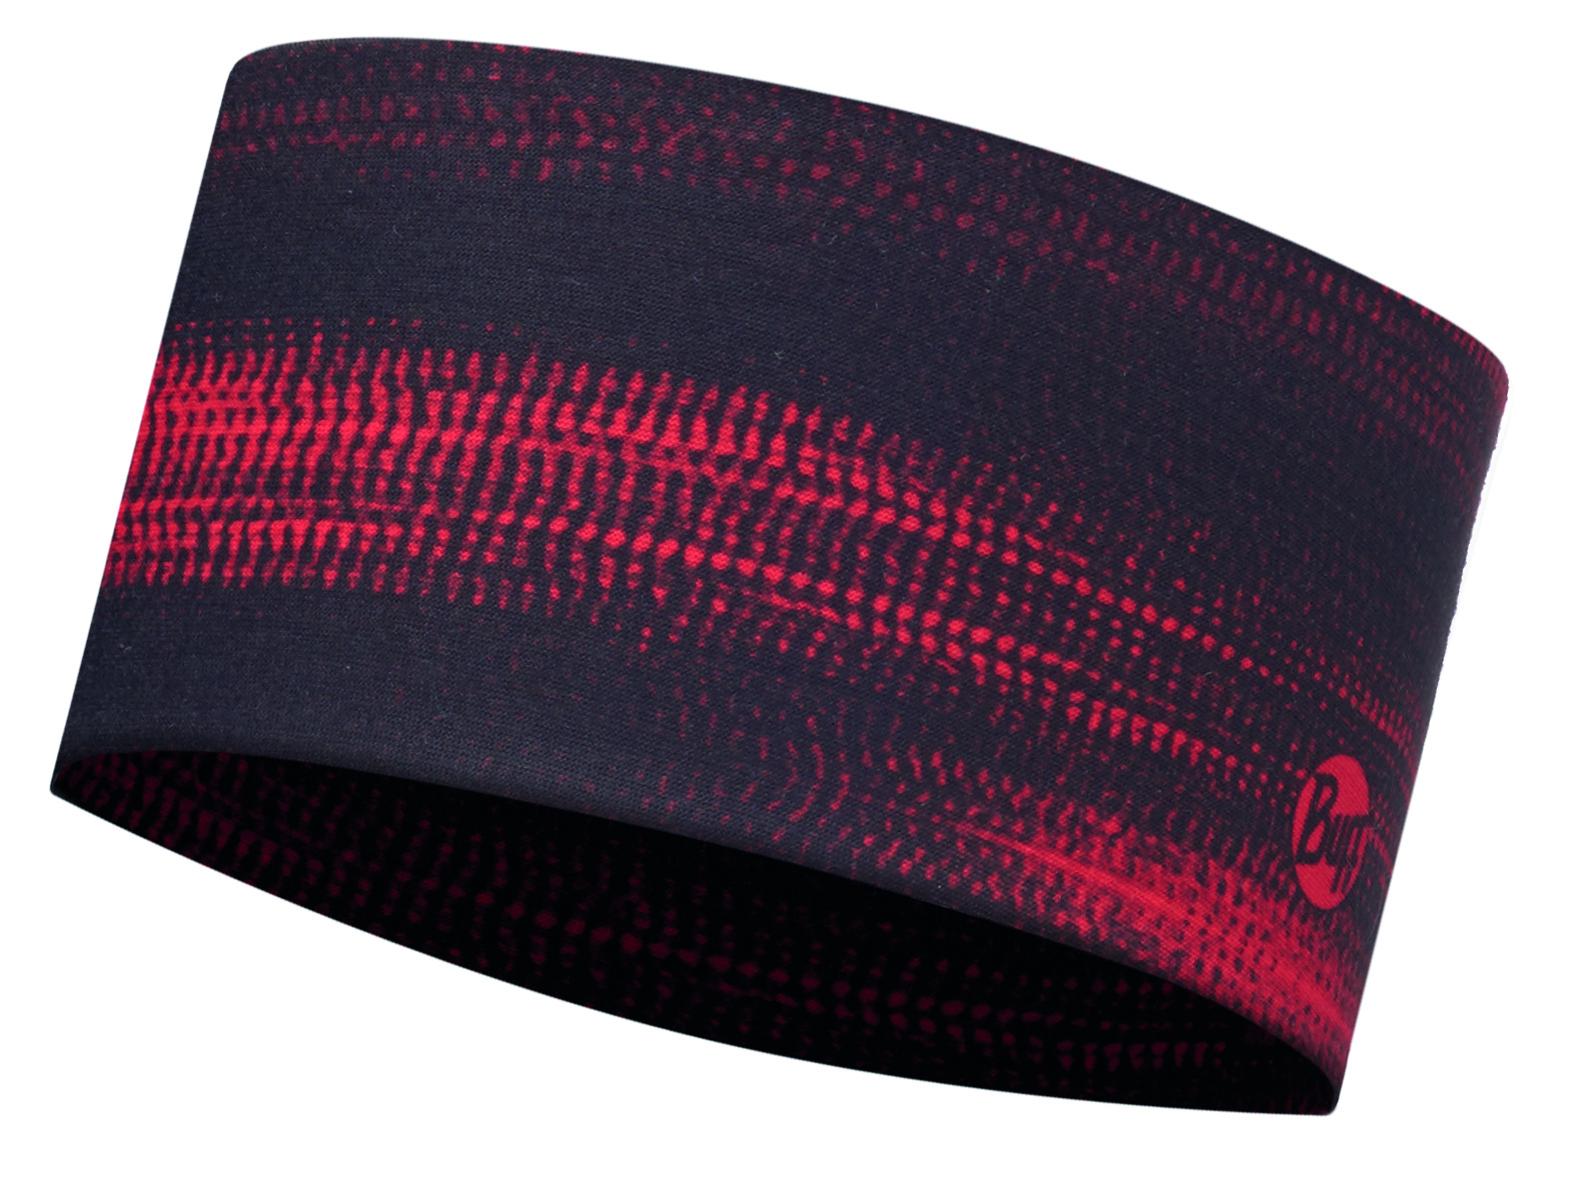 Купить Повязка BUFF Headband STROKE RED Банданы и шарфы Buff ® 1312841